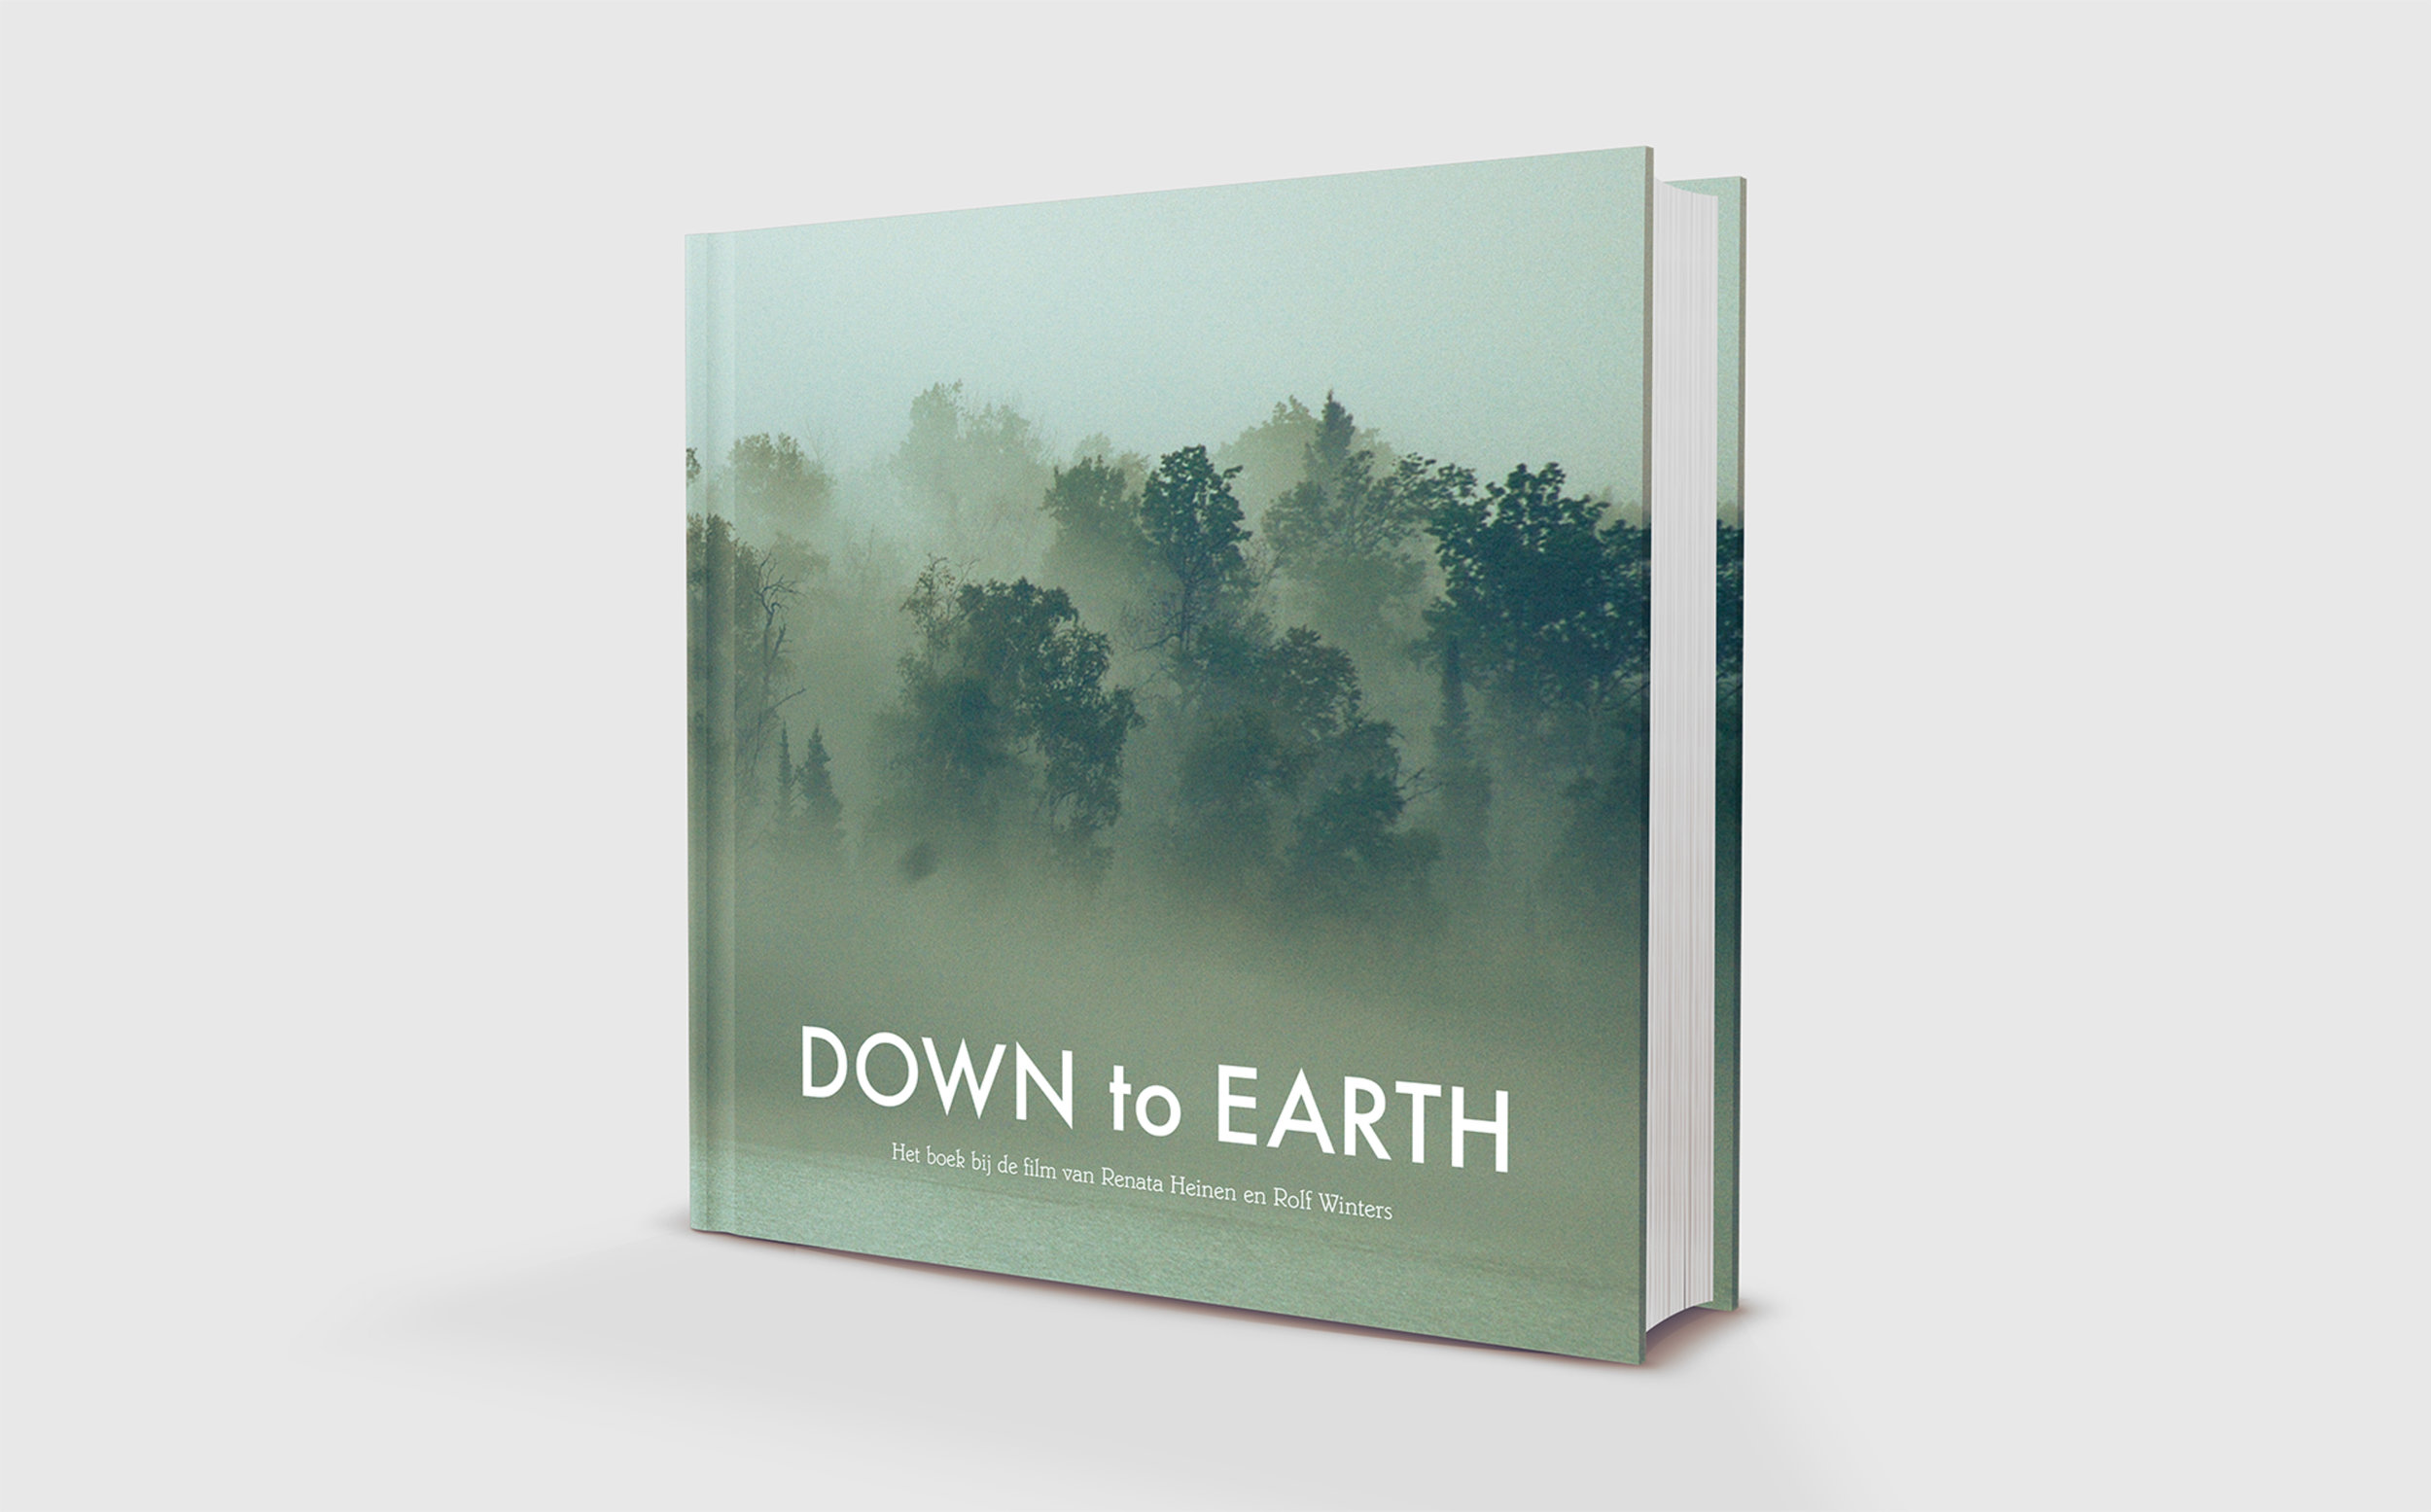 Down to Earth_dutch_digital mock-up-1.jpg